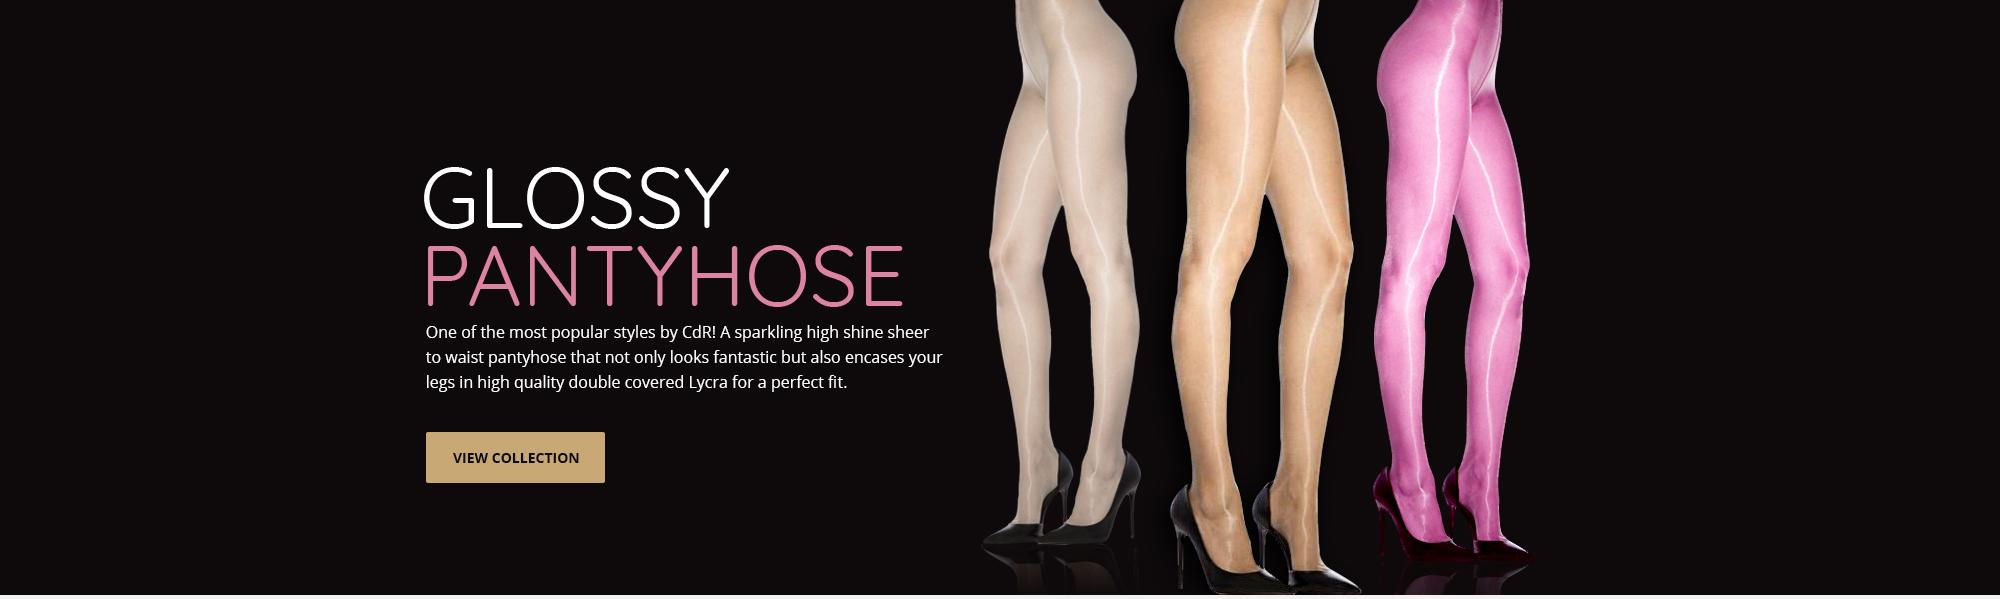 heels nylon Girdles high and stockings